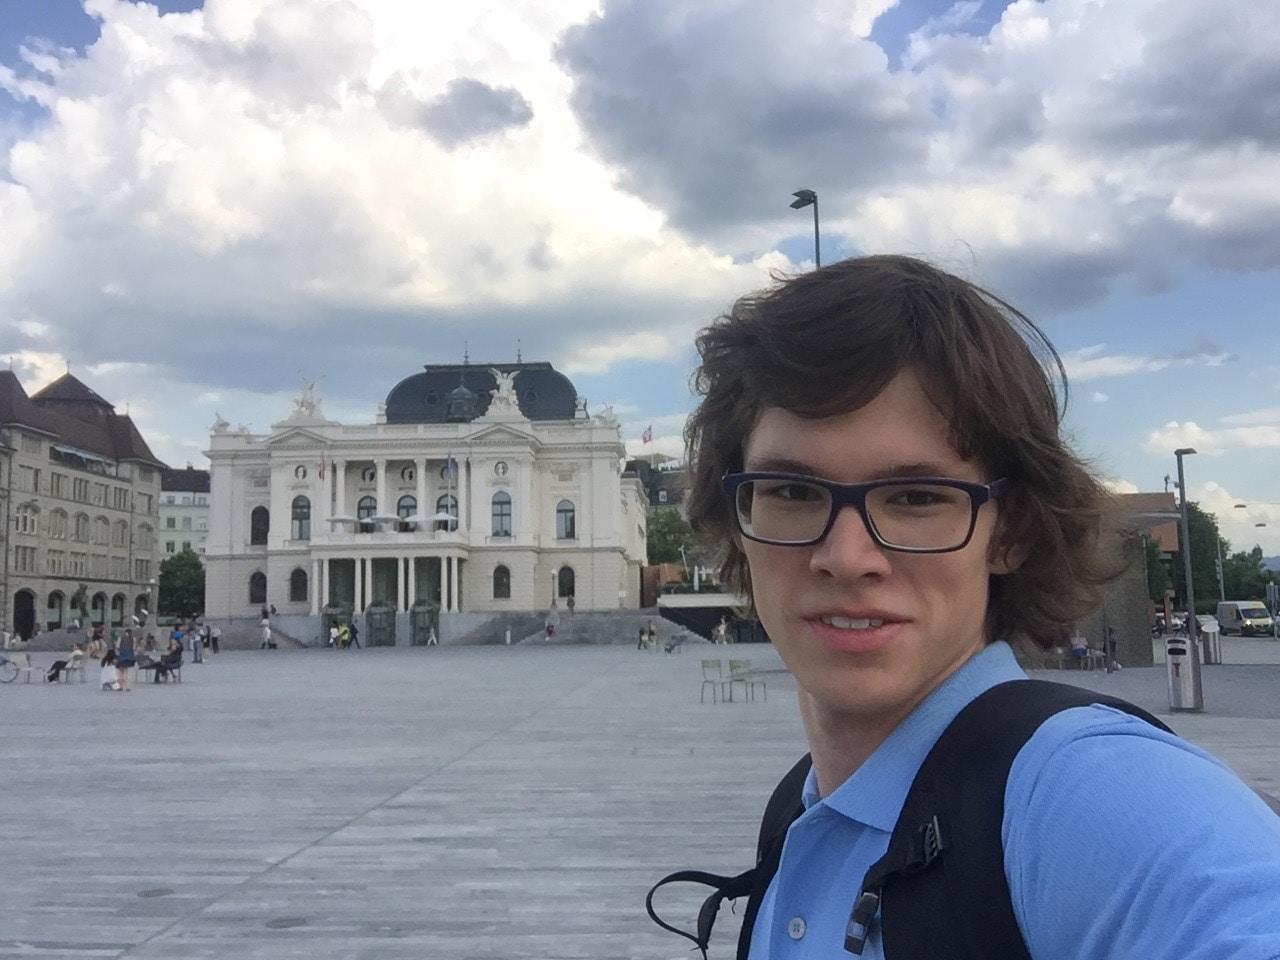 Go to Egor Zhdan's profile